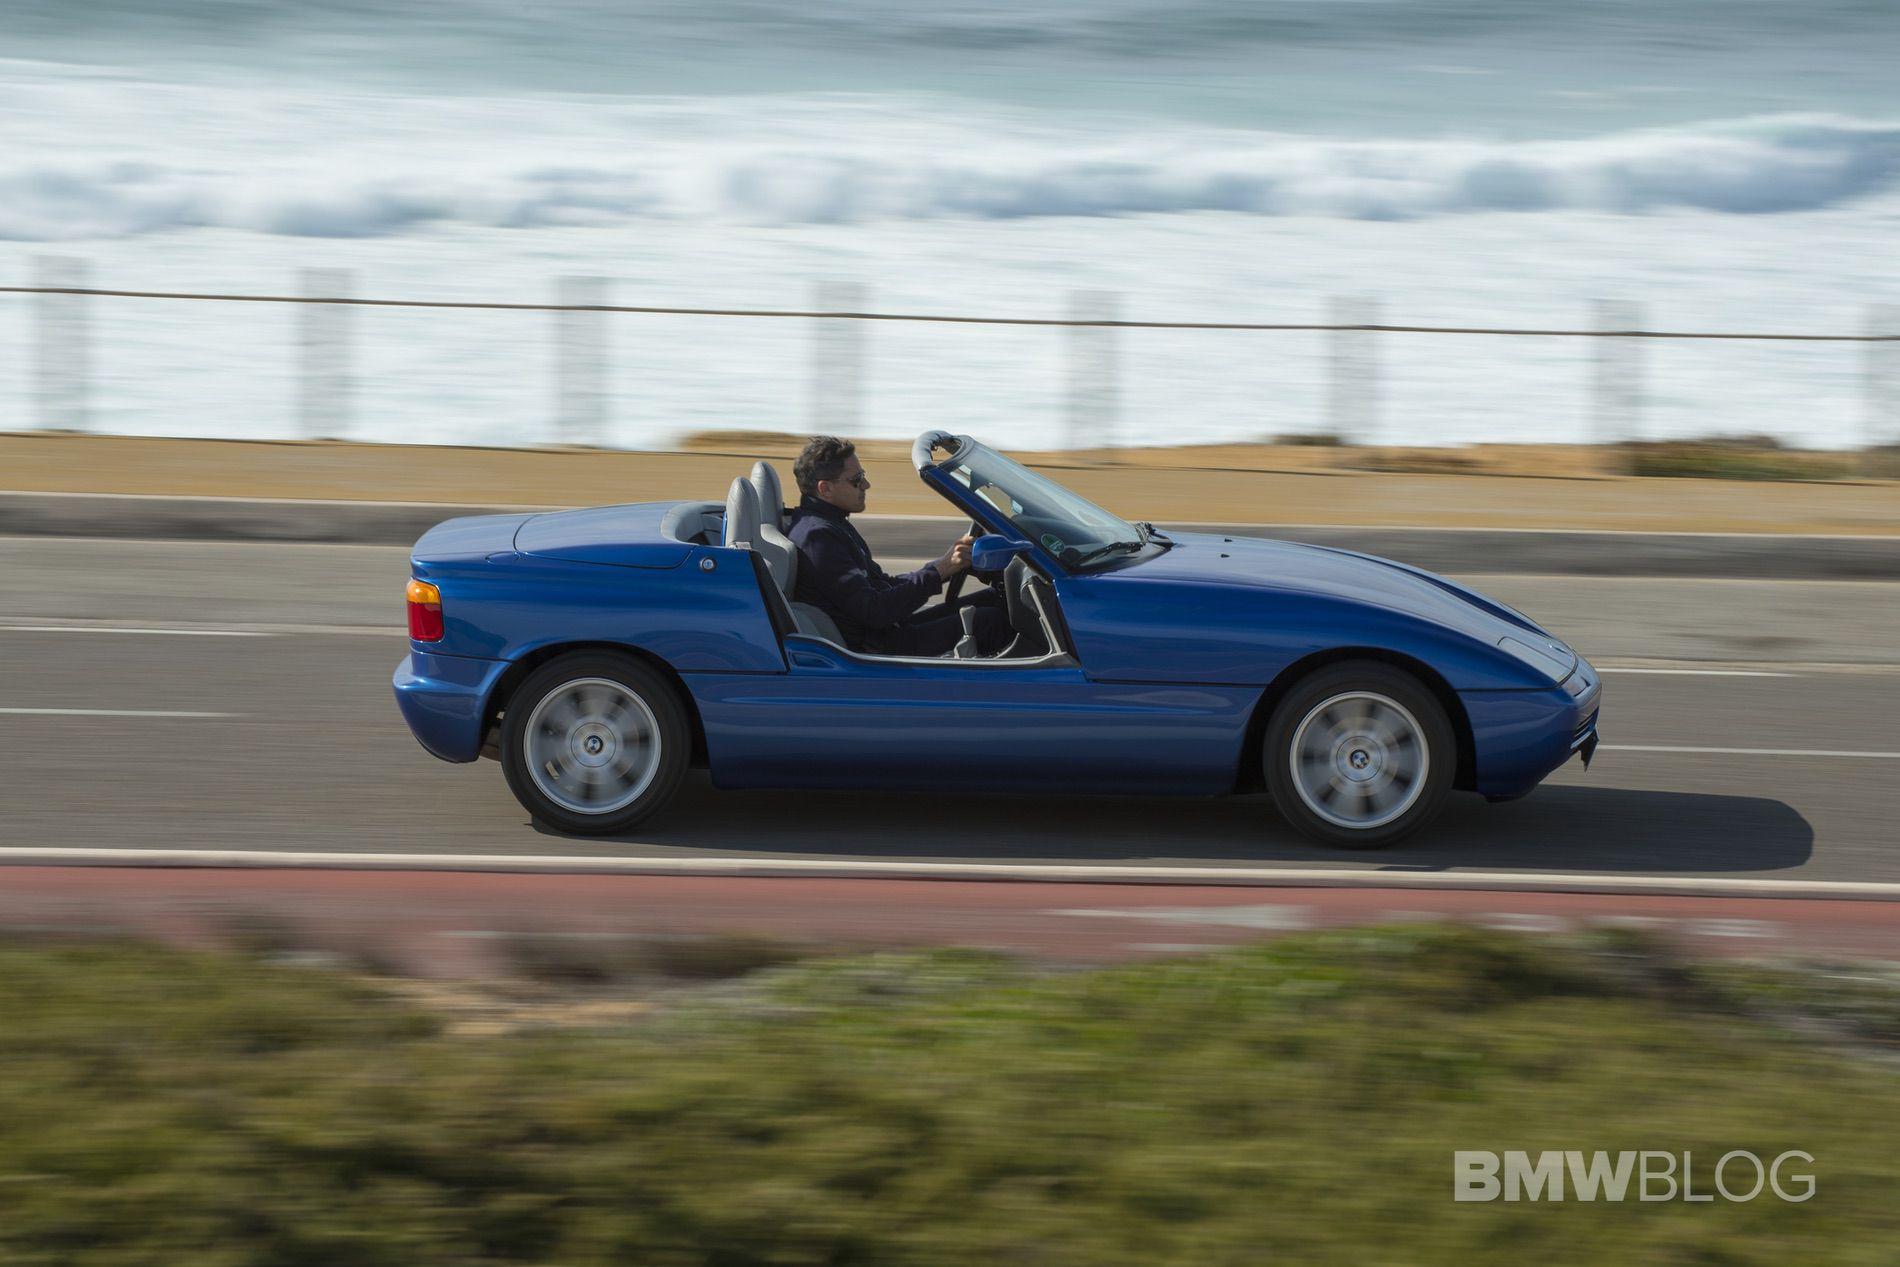 Bmw Z1 The Origin Of The Modern Day Bmw Roadster Family